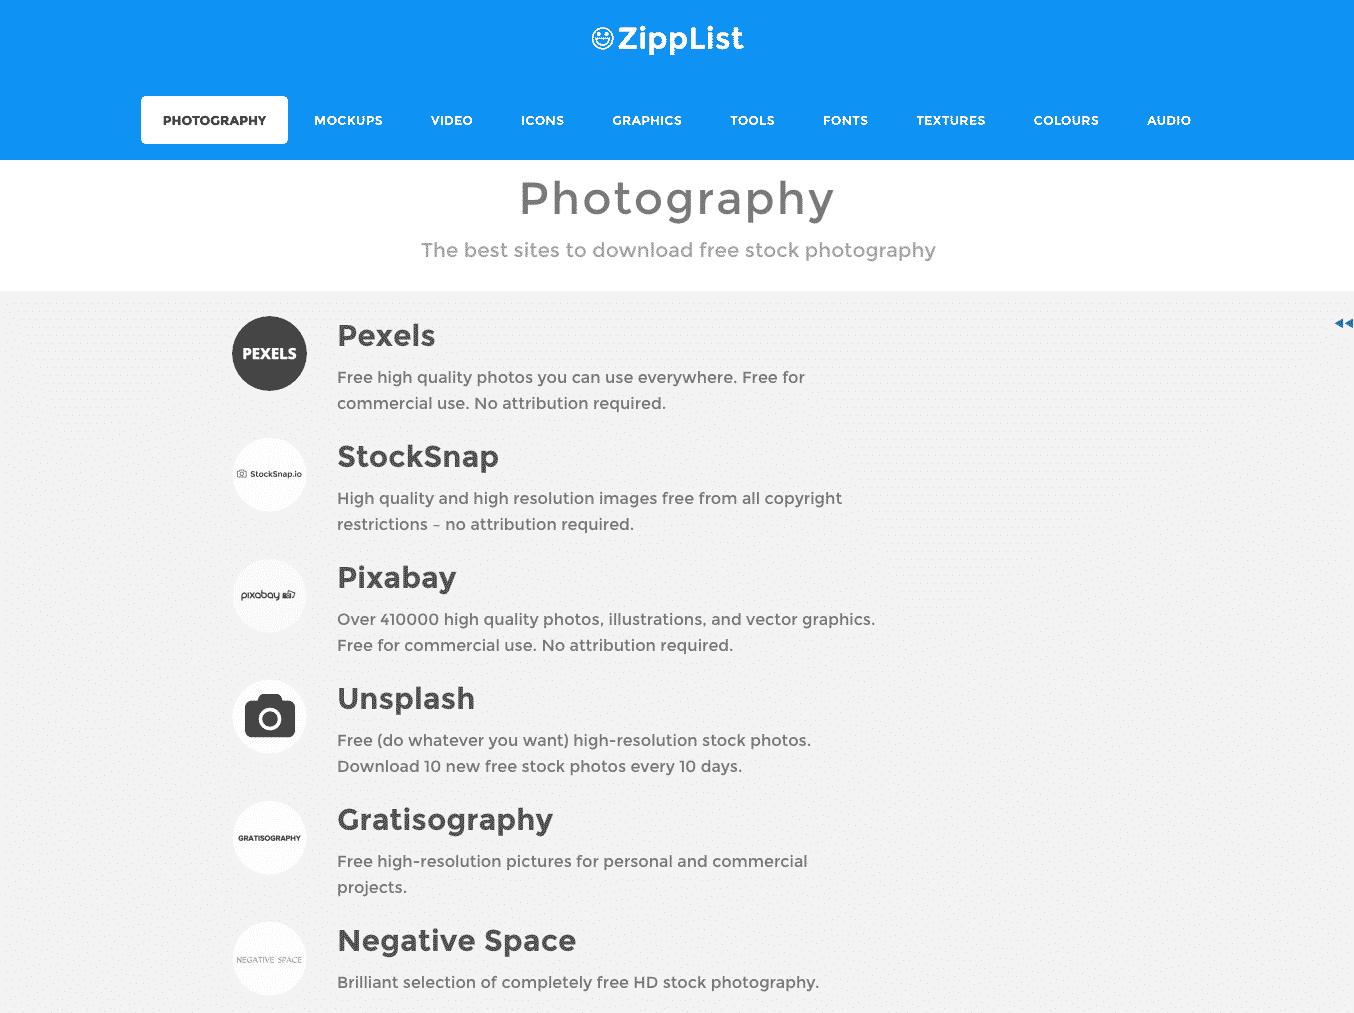 zipplist